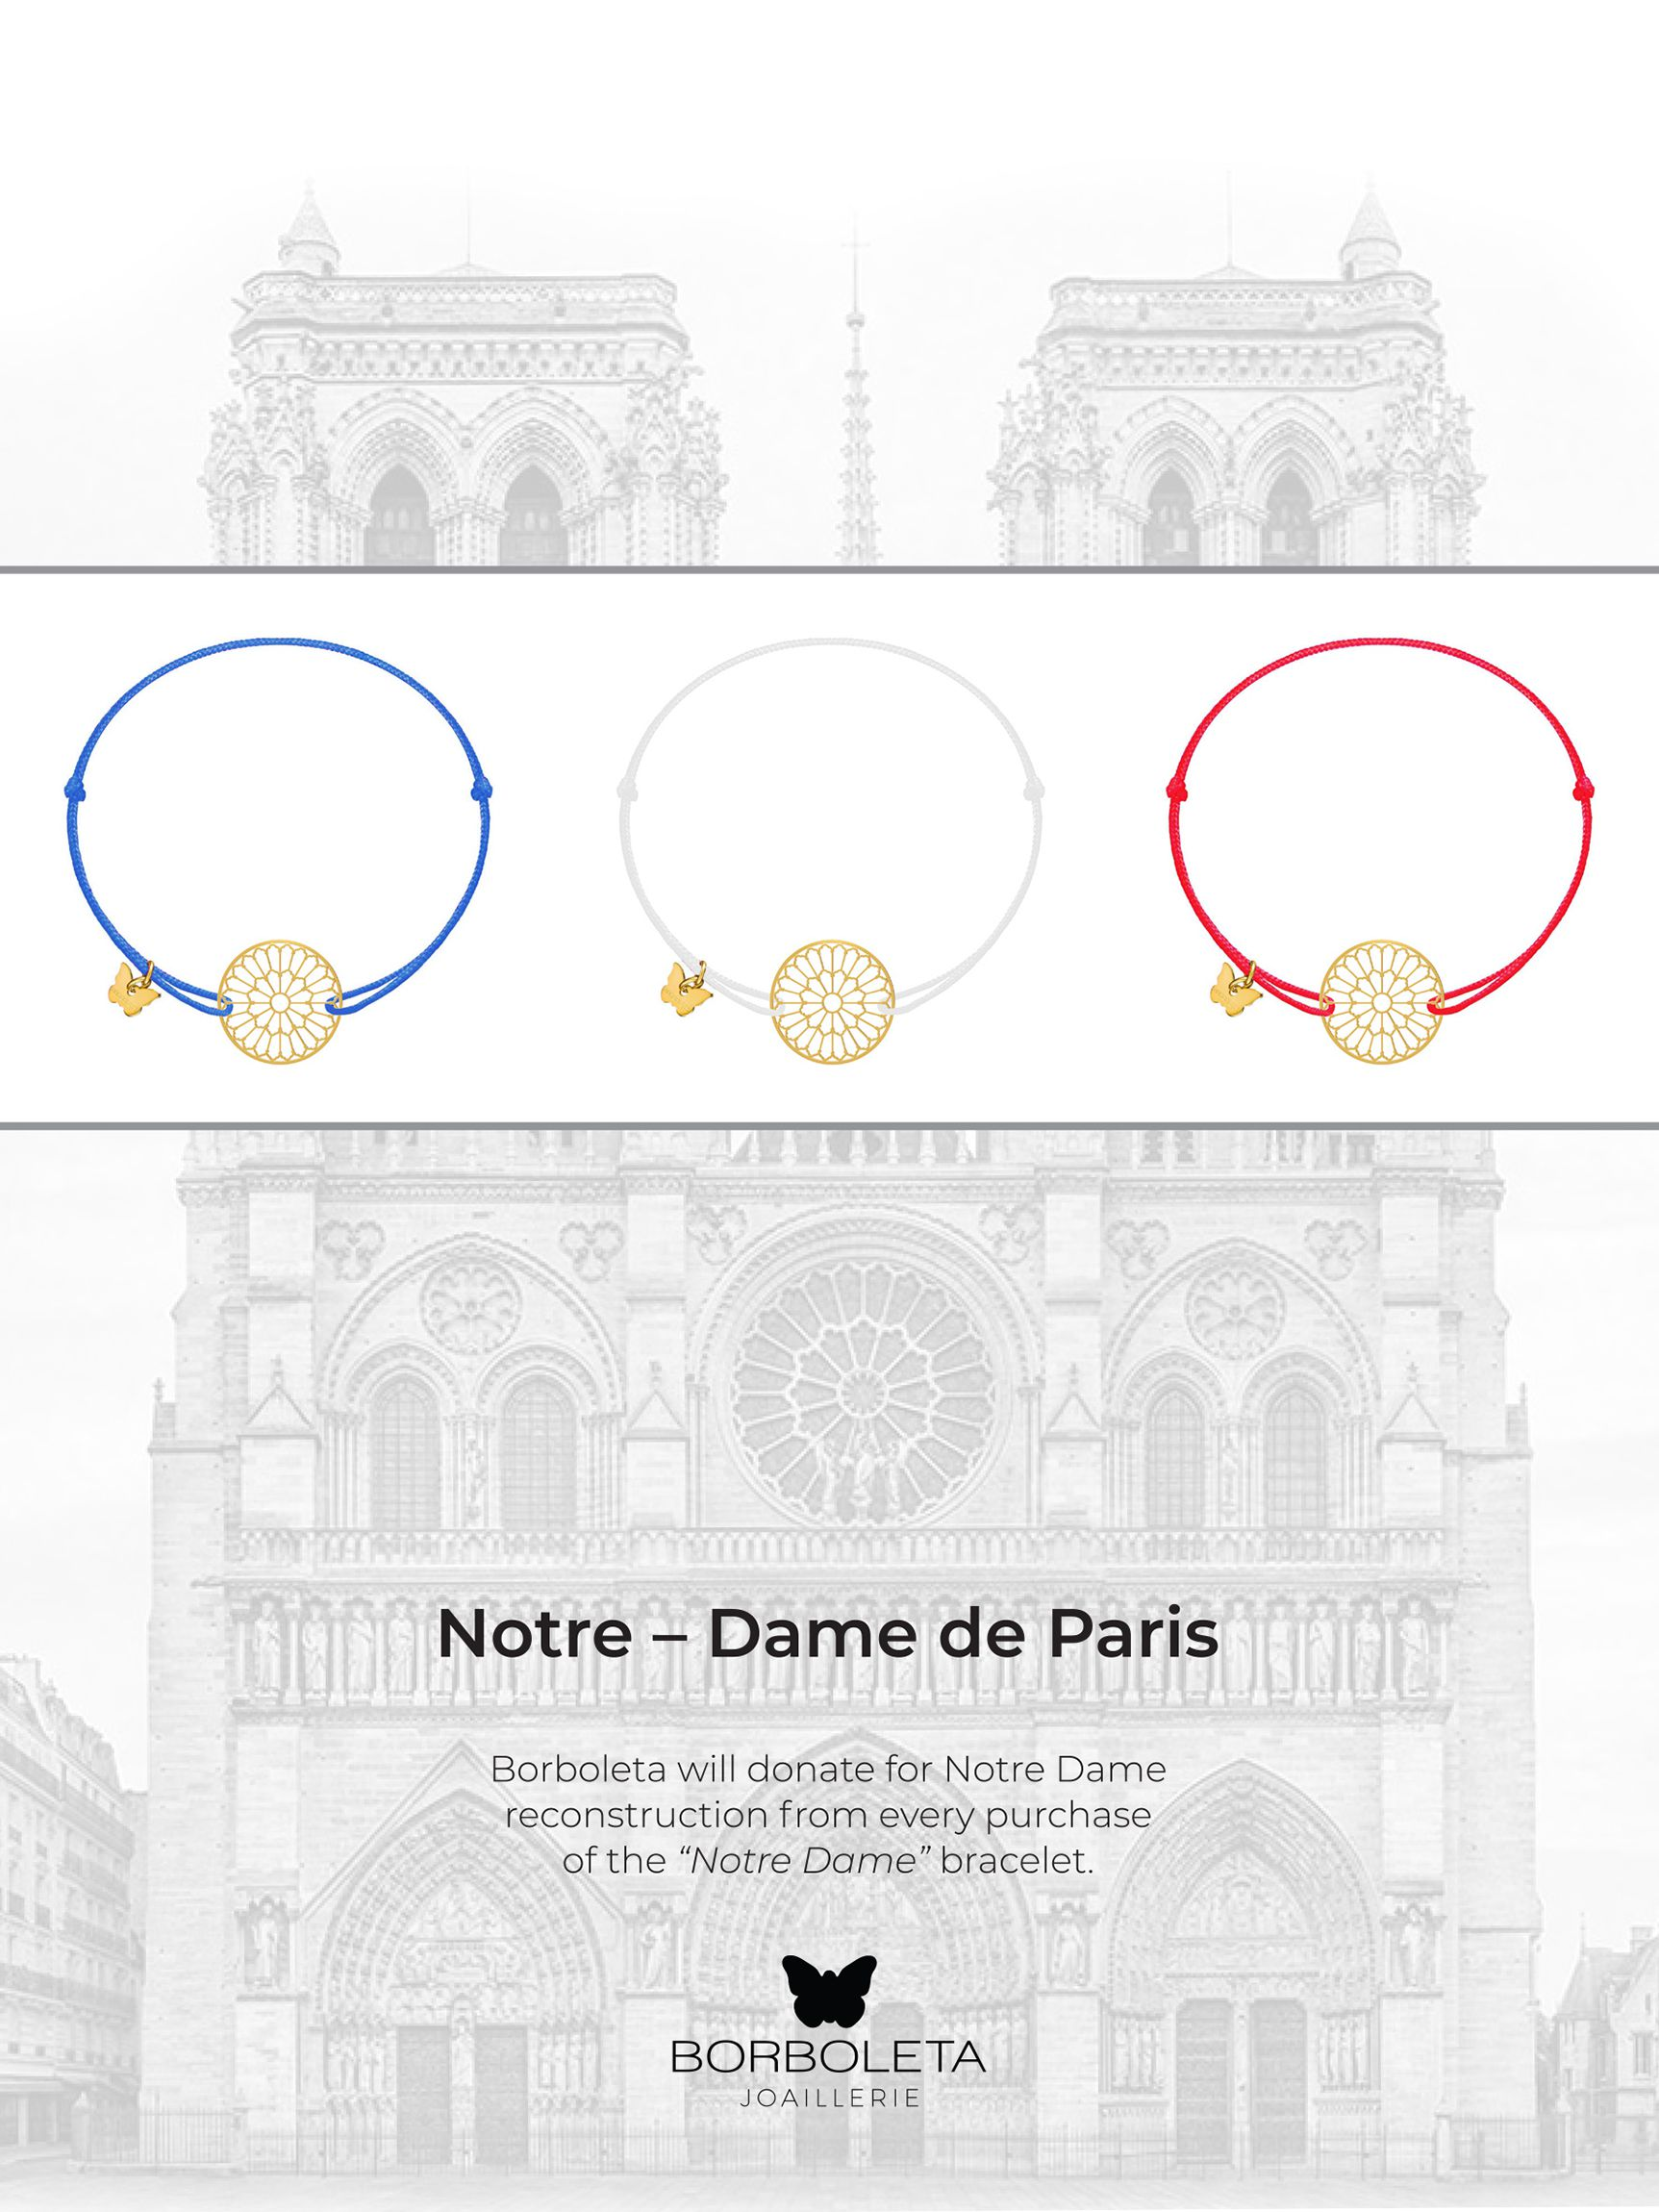 Borboleta narukvice u akciji za obnovu čuvene katedrale Notre-Dame